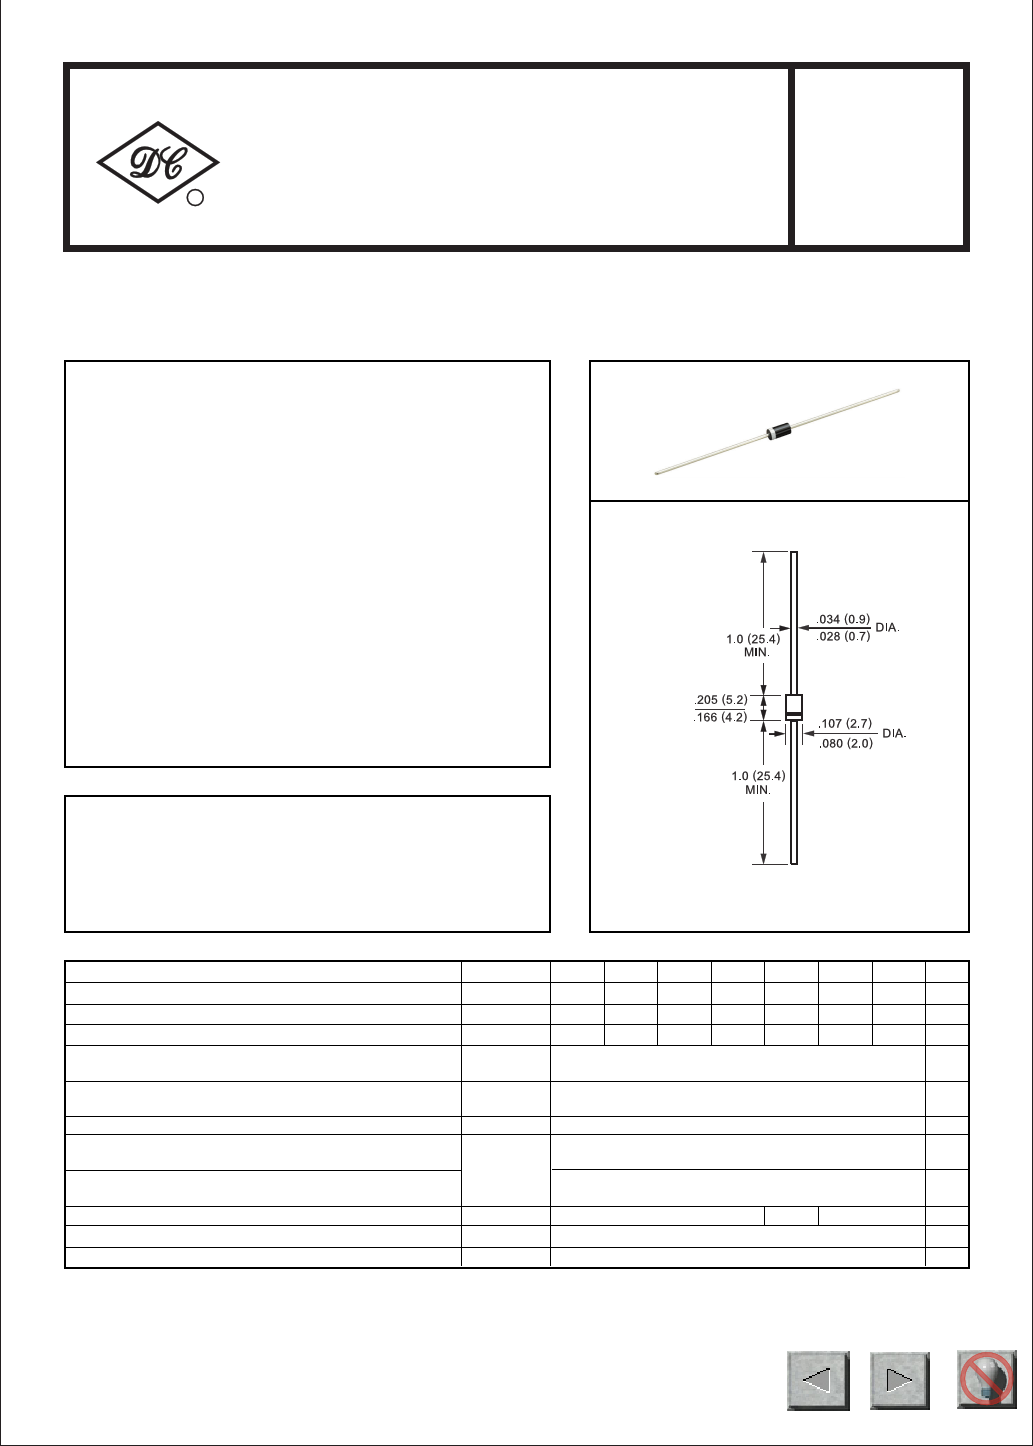 Fr107 datasheet